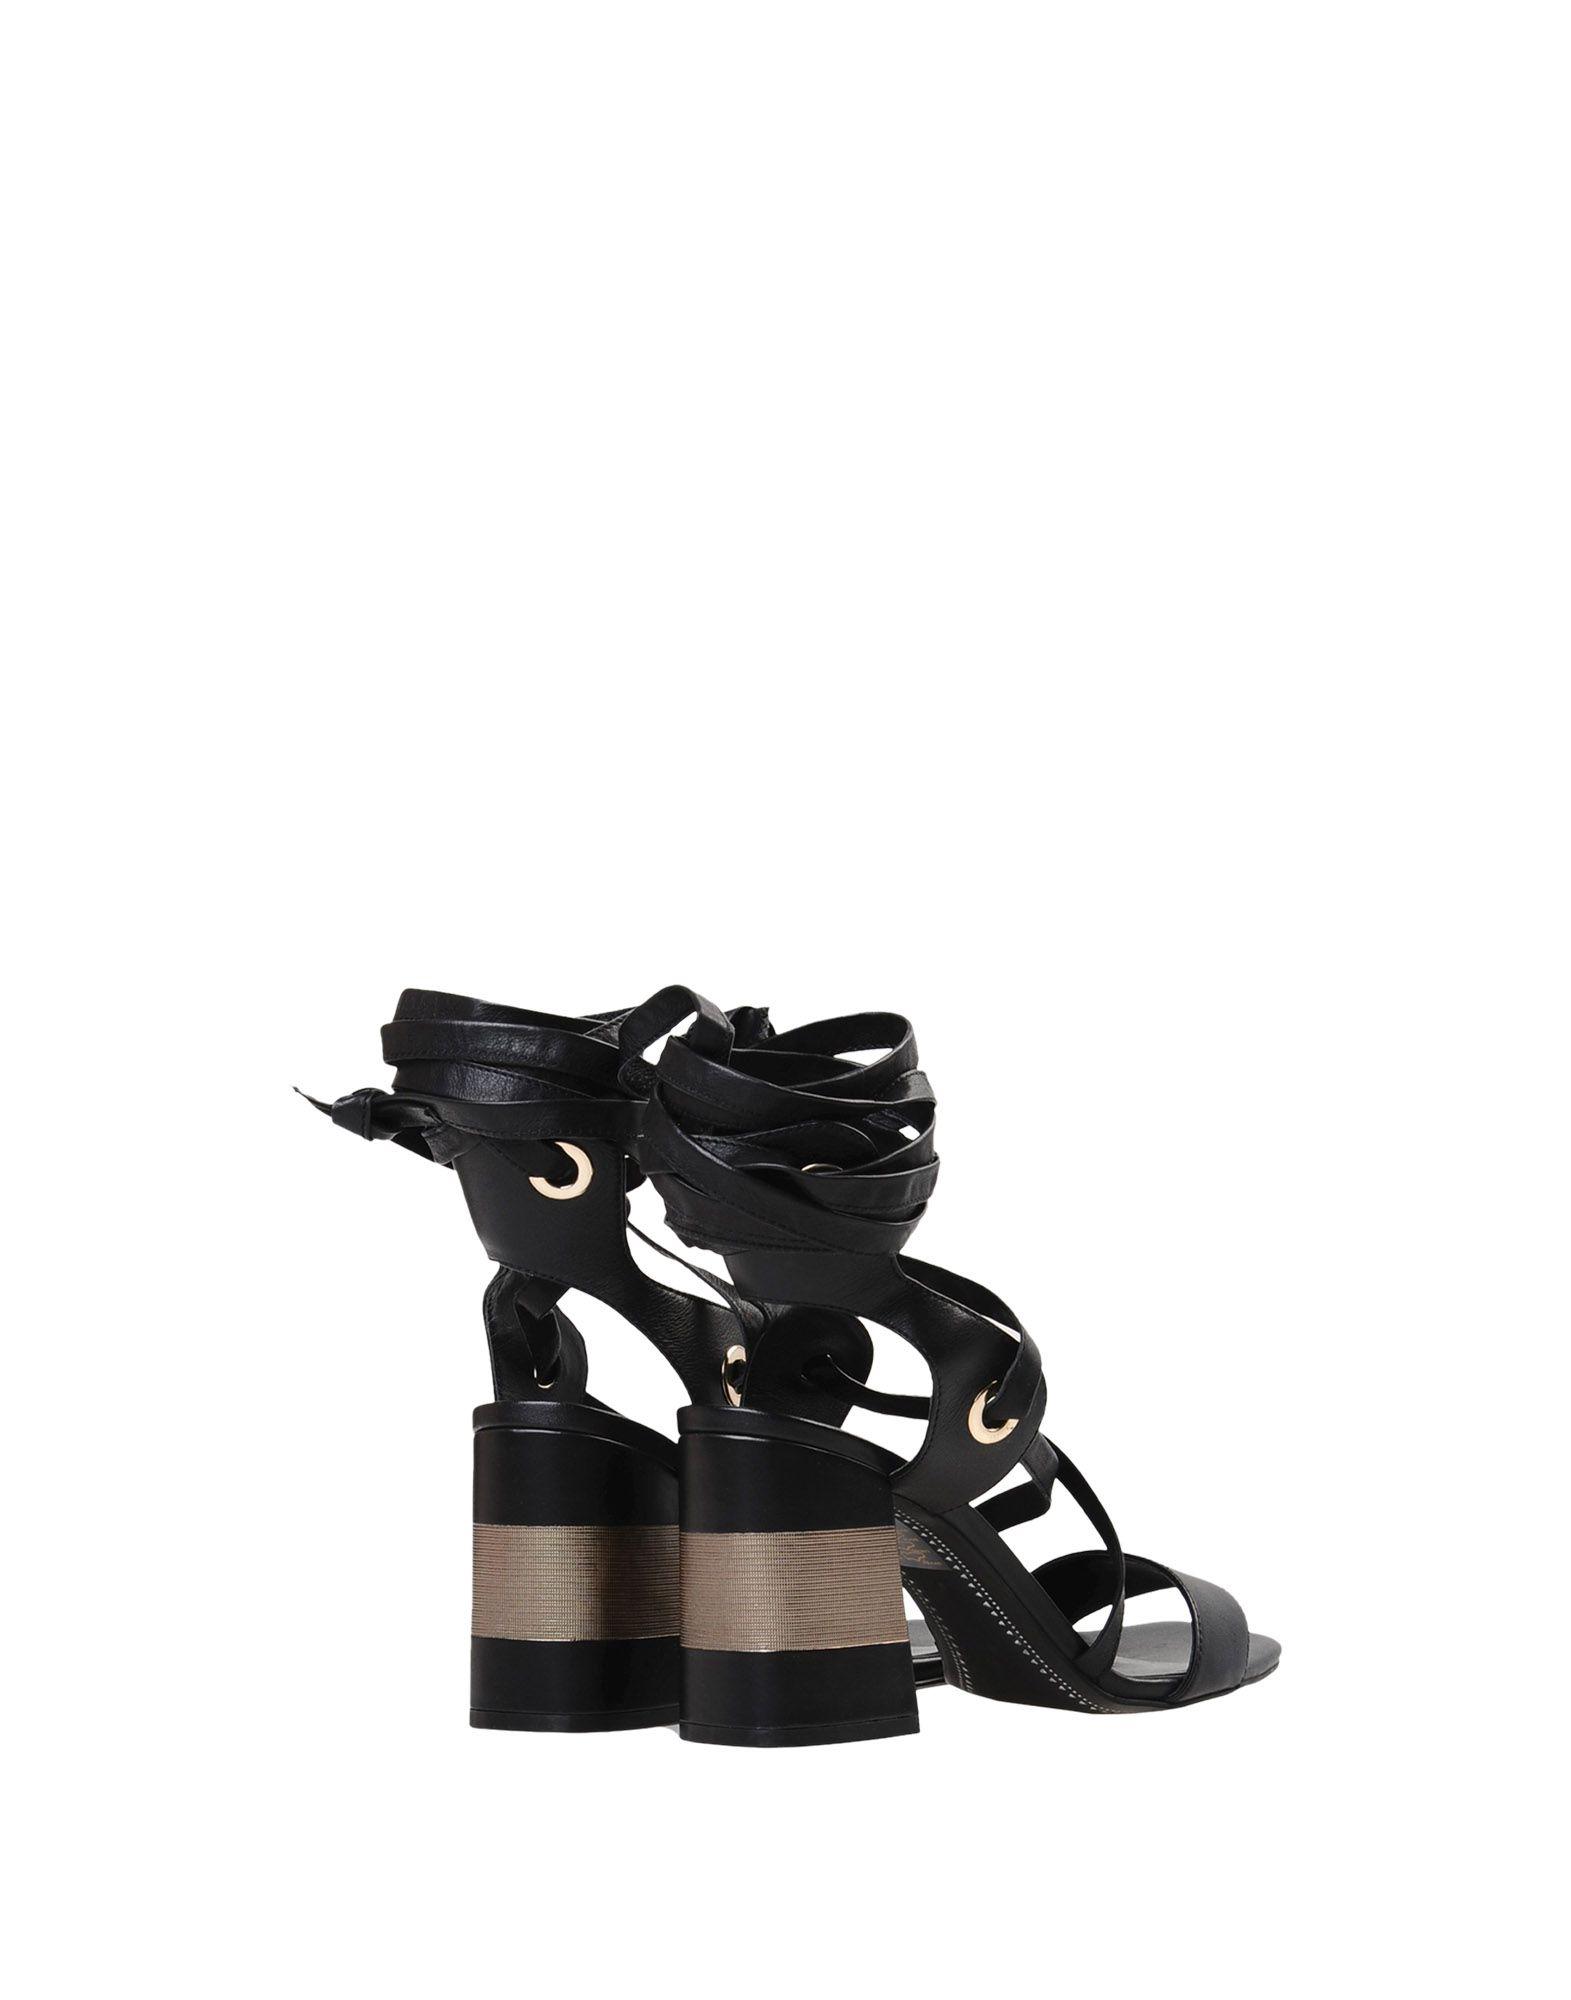 Bruno 11464466QM Premi Sandalen Damen  11464466QM Bruno Gute Qualität beliebte Schuhe 8678a7